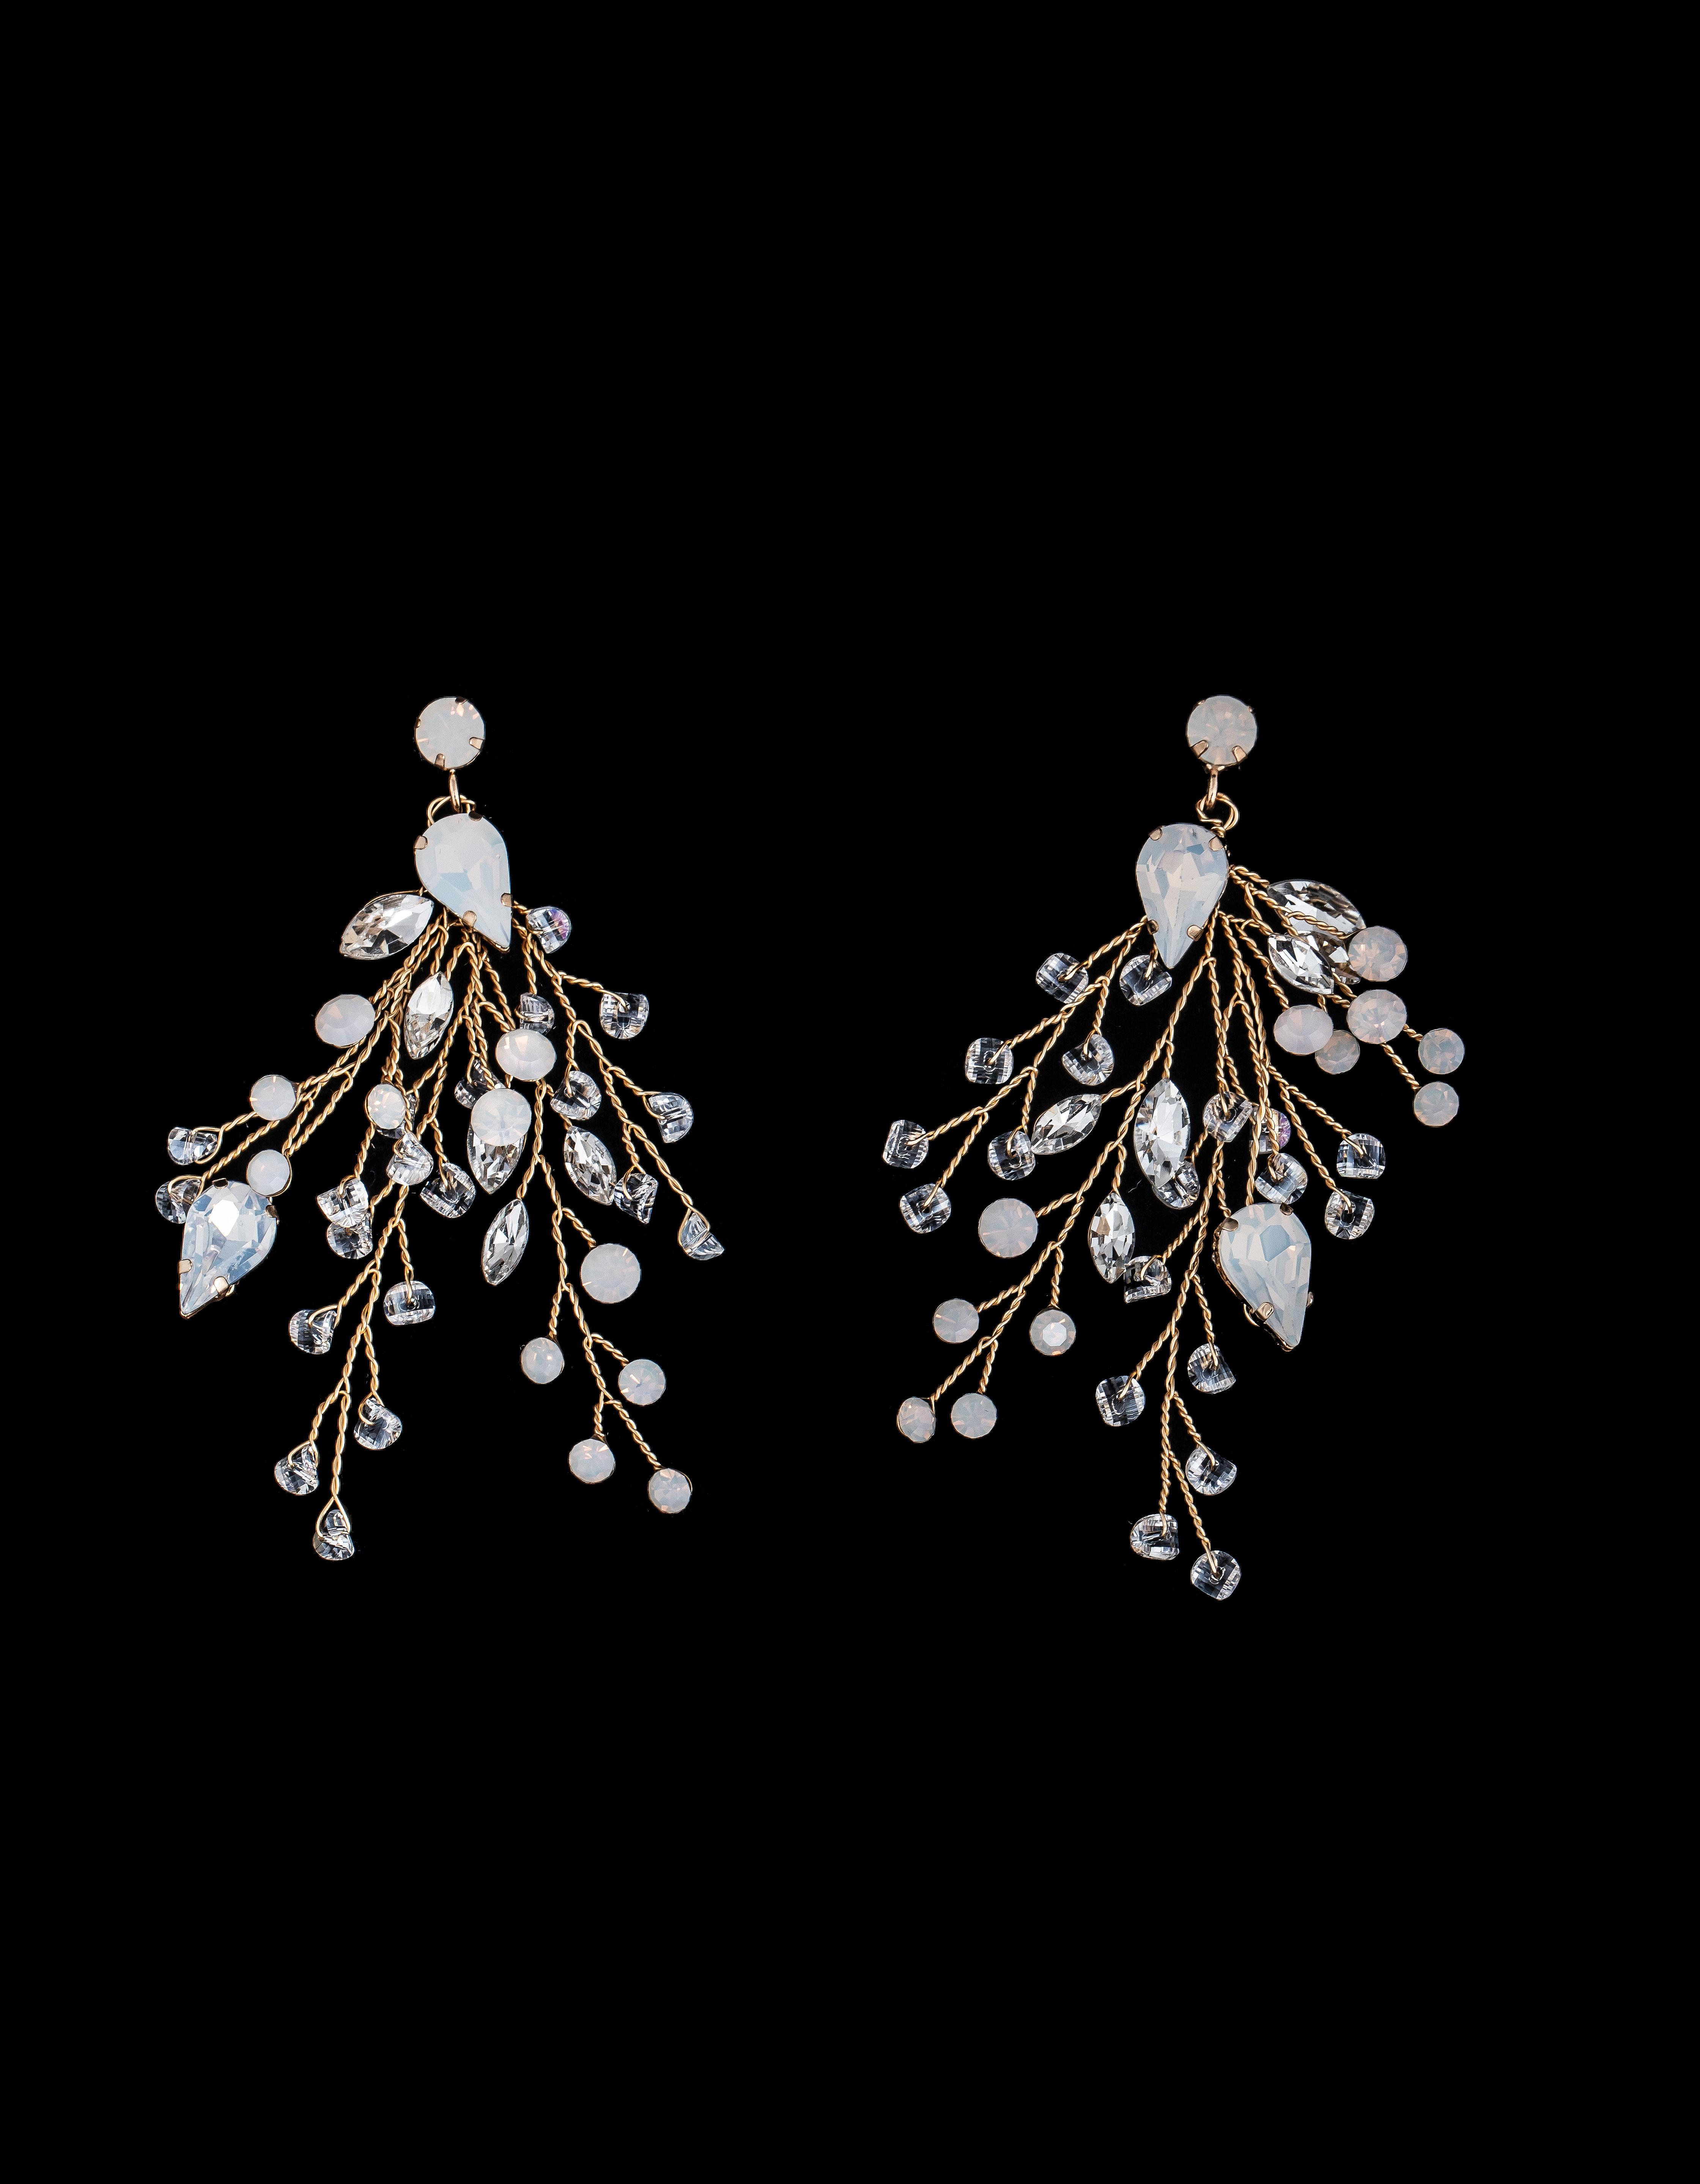 Bridal Classics Earrings MJ-332